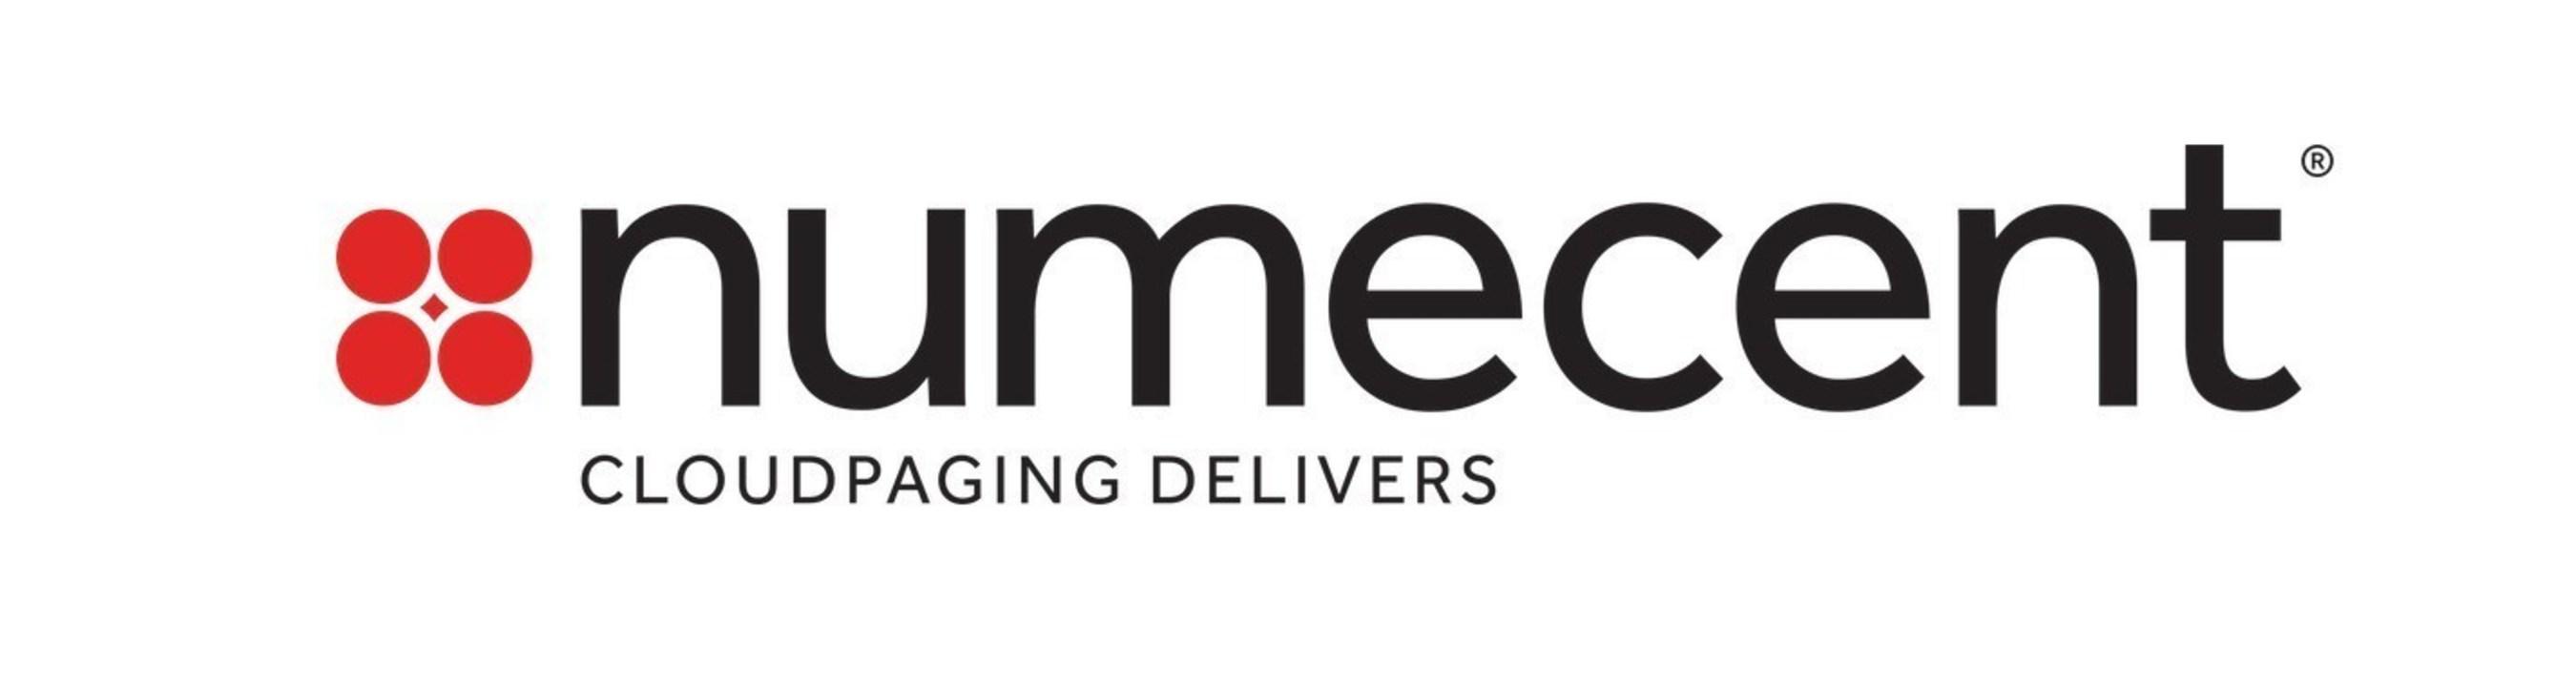 Numecent Logo (PRNewsFoto/Numecent)